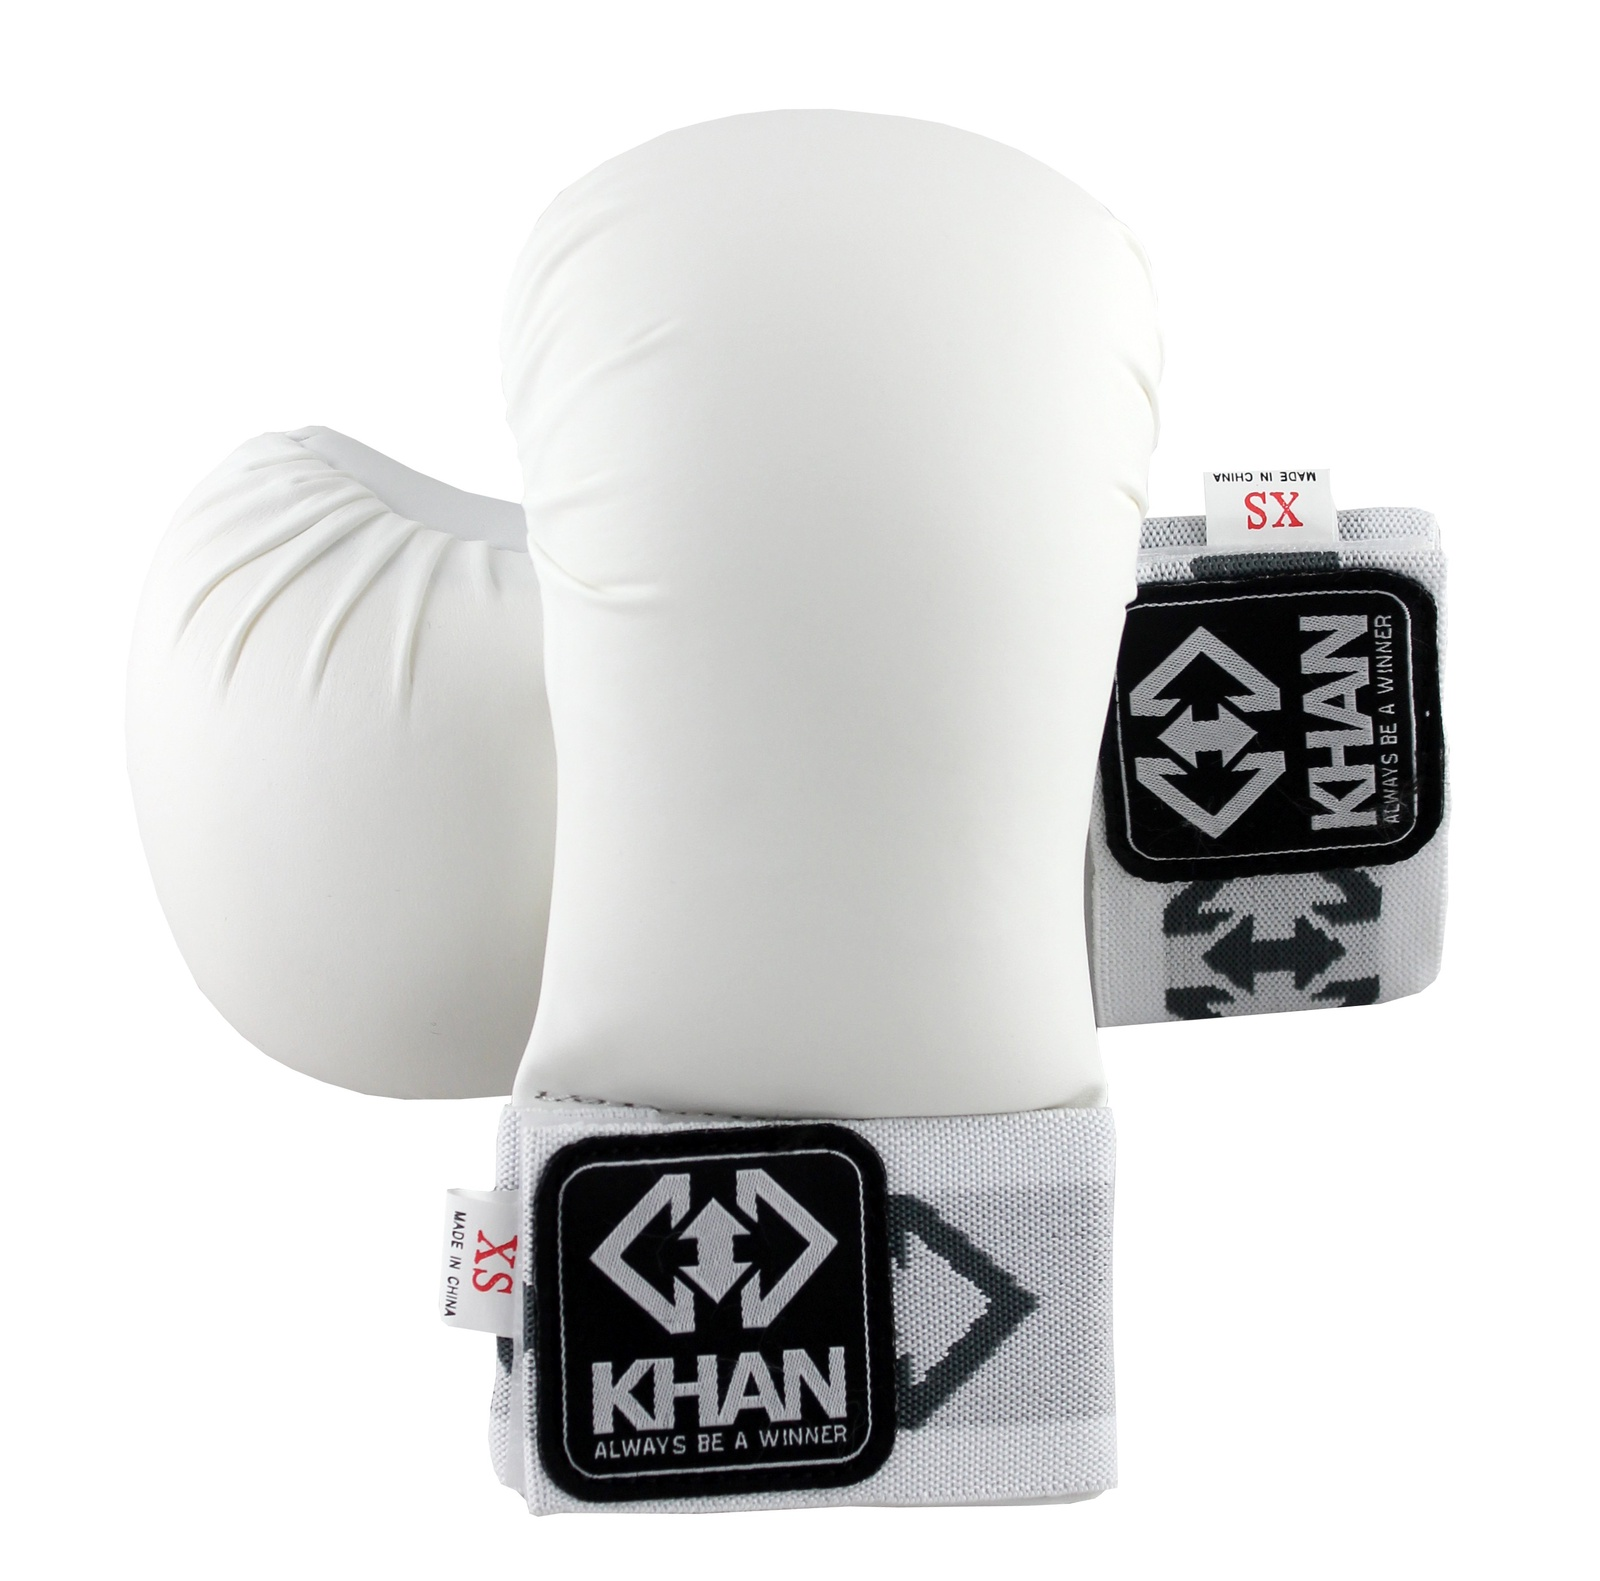 Накладки на кисть Каратэ Khan Shotokan, белый. KG201601-1. Размер XS накладки на кисть каратэ khan shotokan белый kg201601 2 размер s